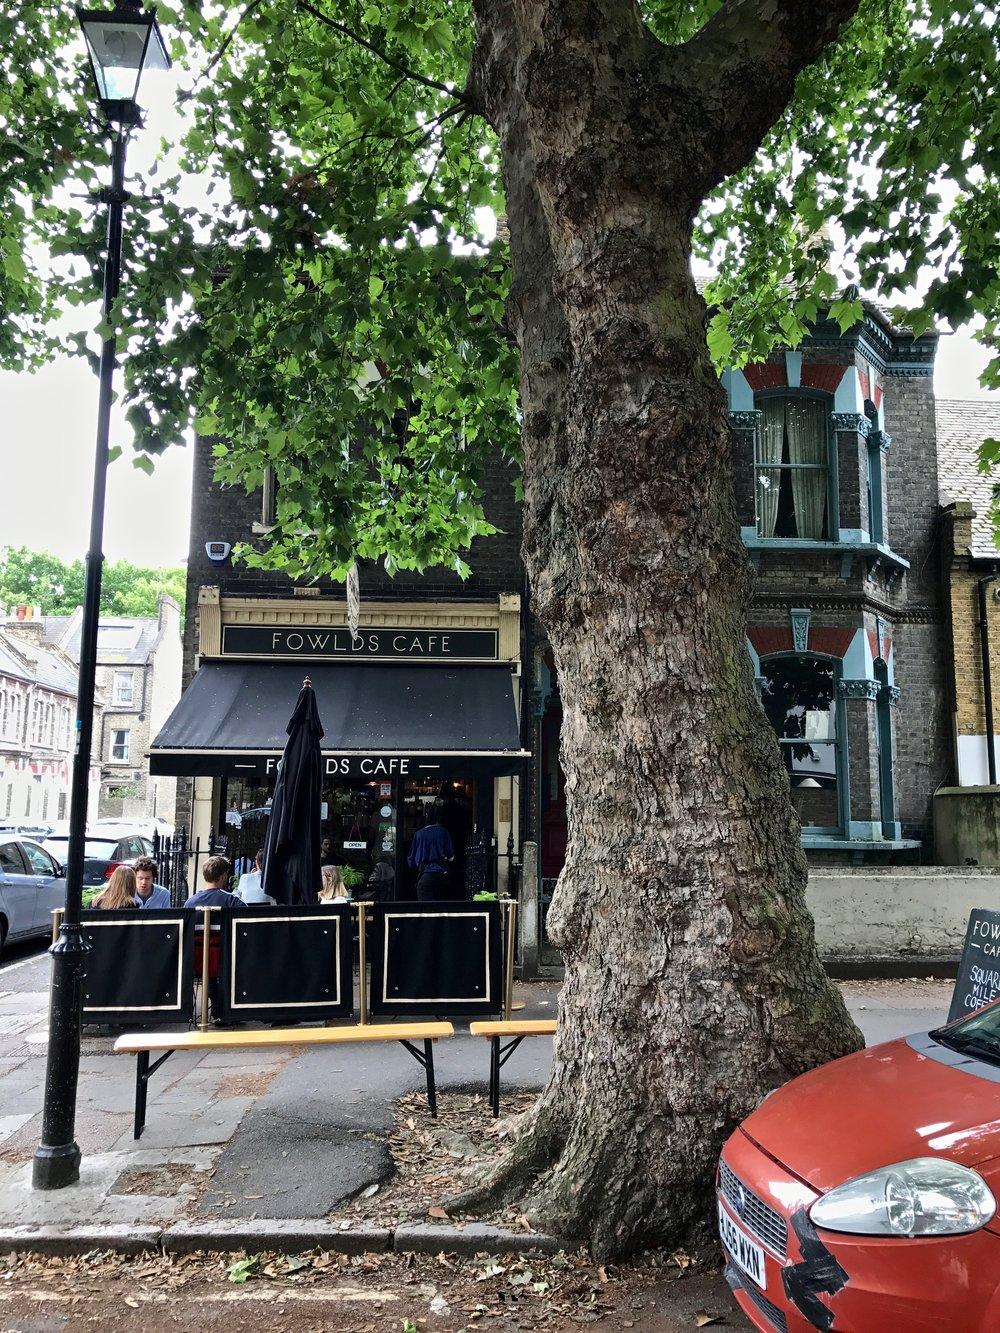 Fowld's Cafe (c) when i've got time_4166.jpg